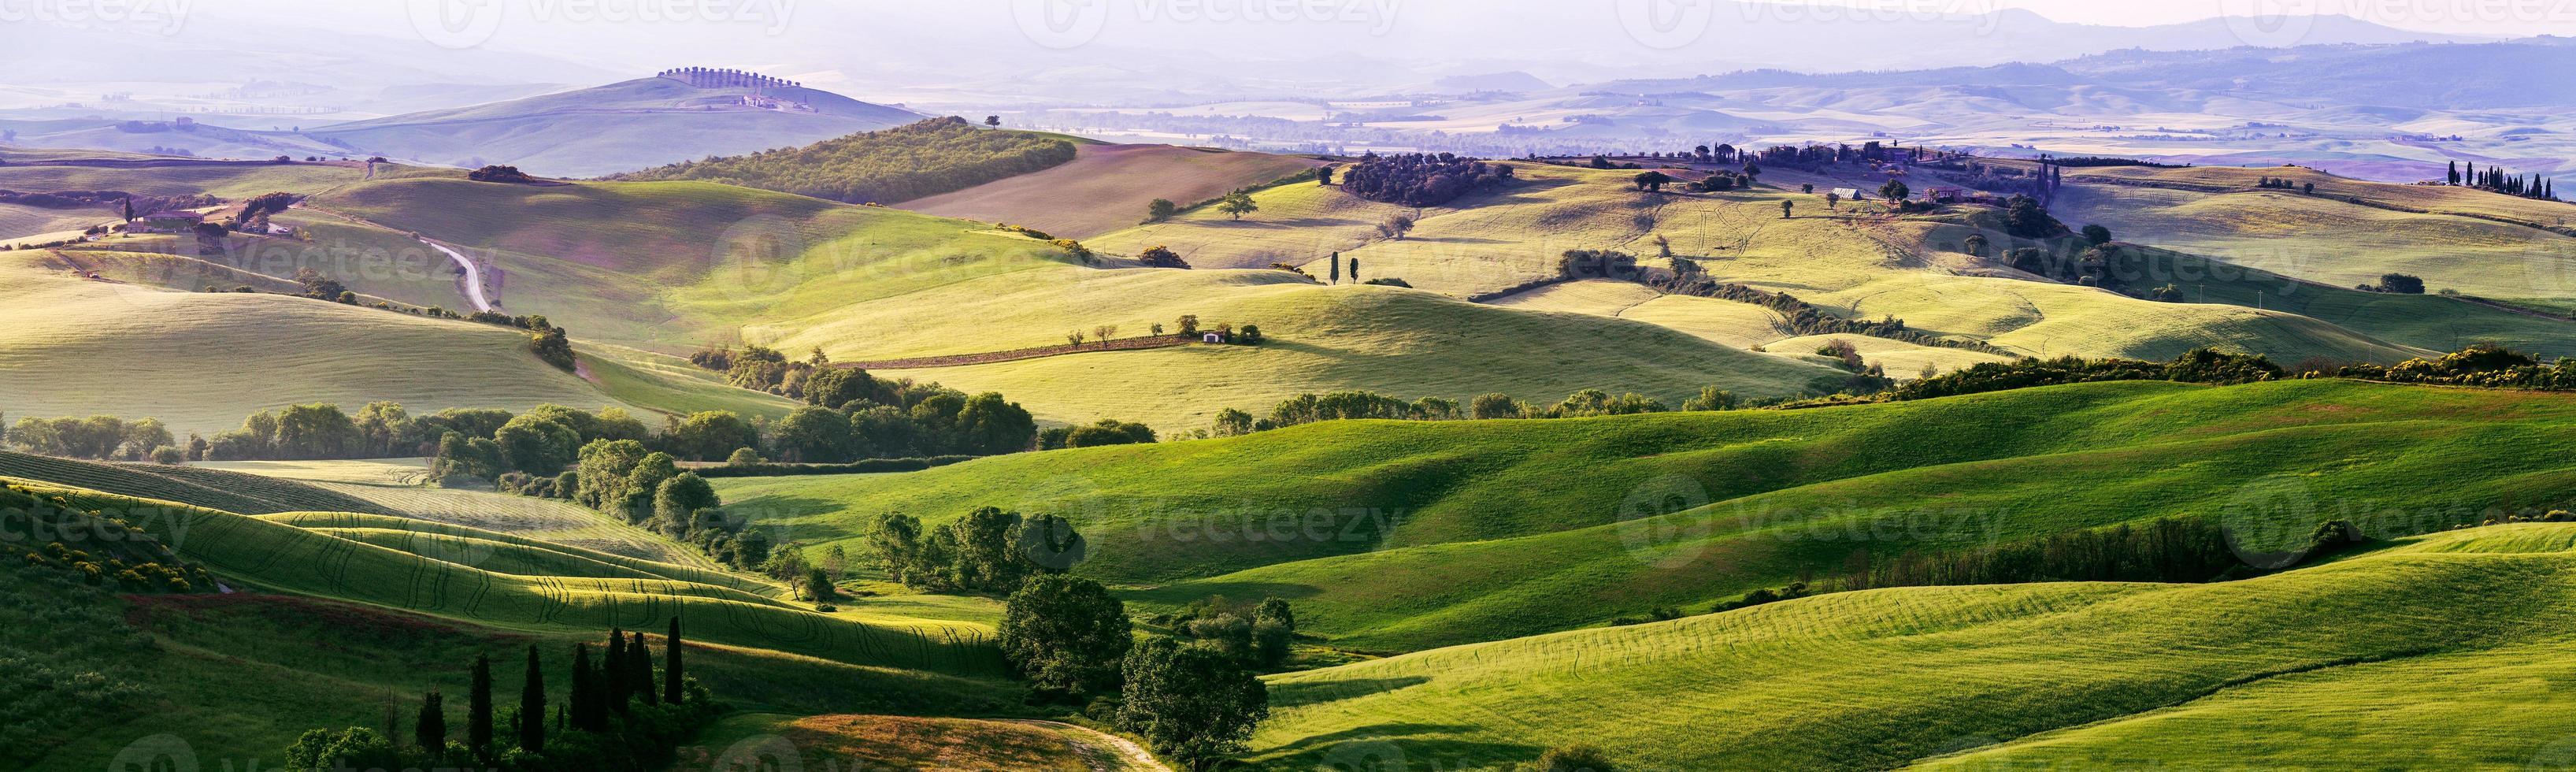 belas e milagrosas cores de verde primavera panorama landsca foto